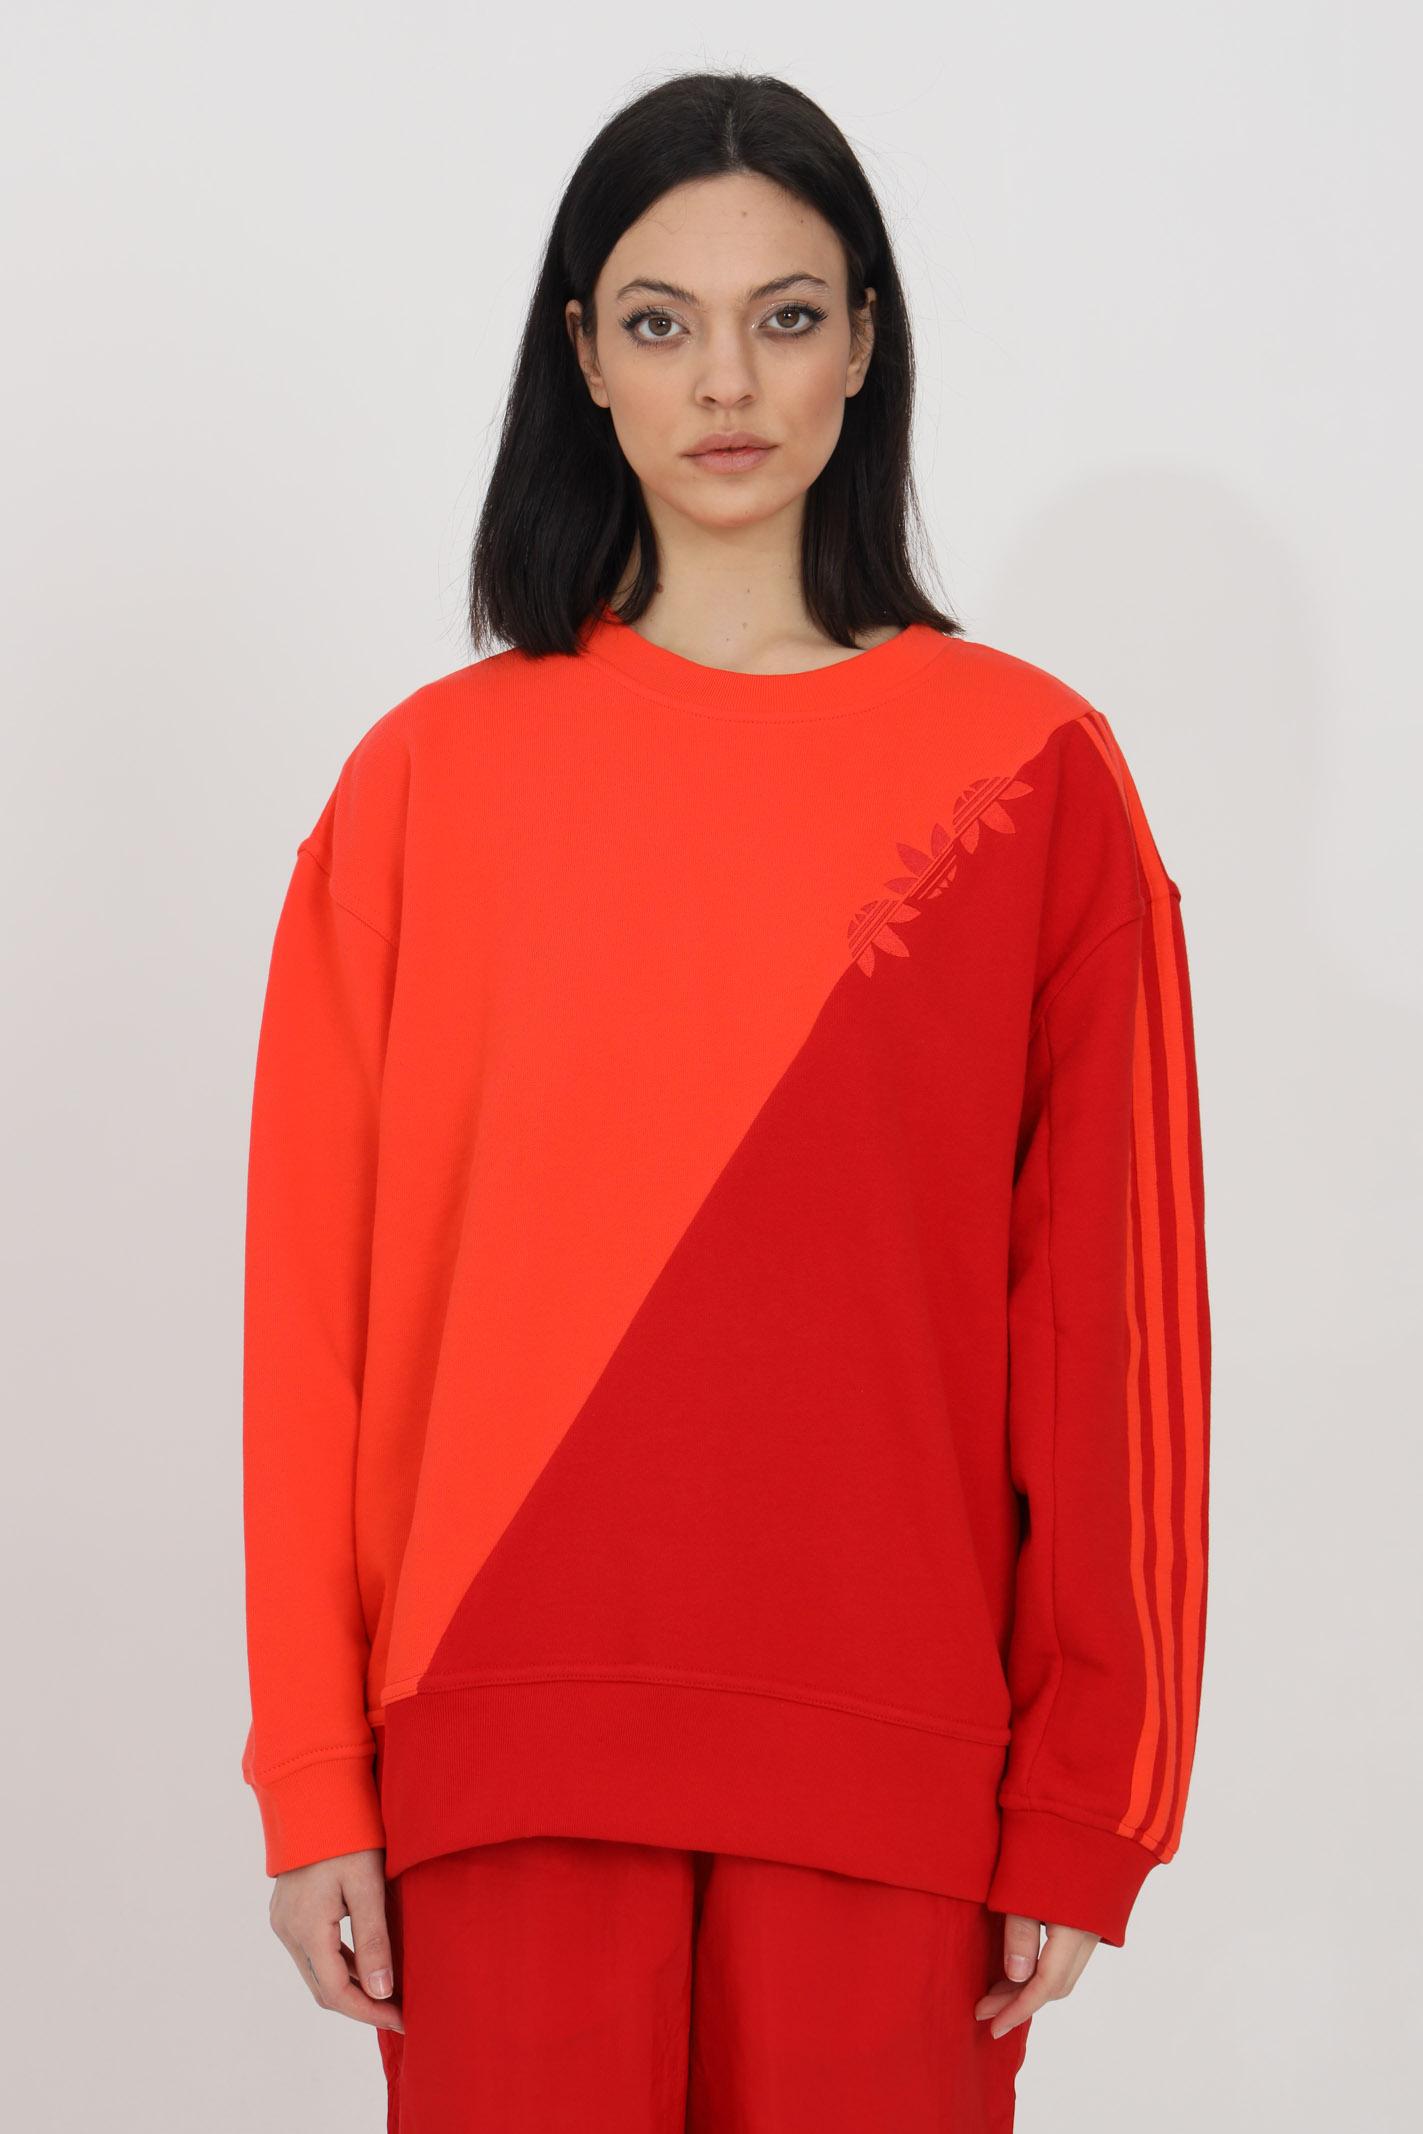 Bicolor crew neck sweatshirt with front logo ADIDAS | Sweatshirt | GN2834.